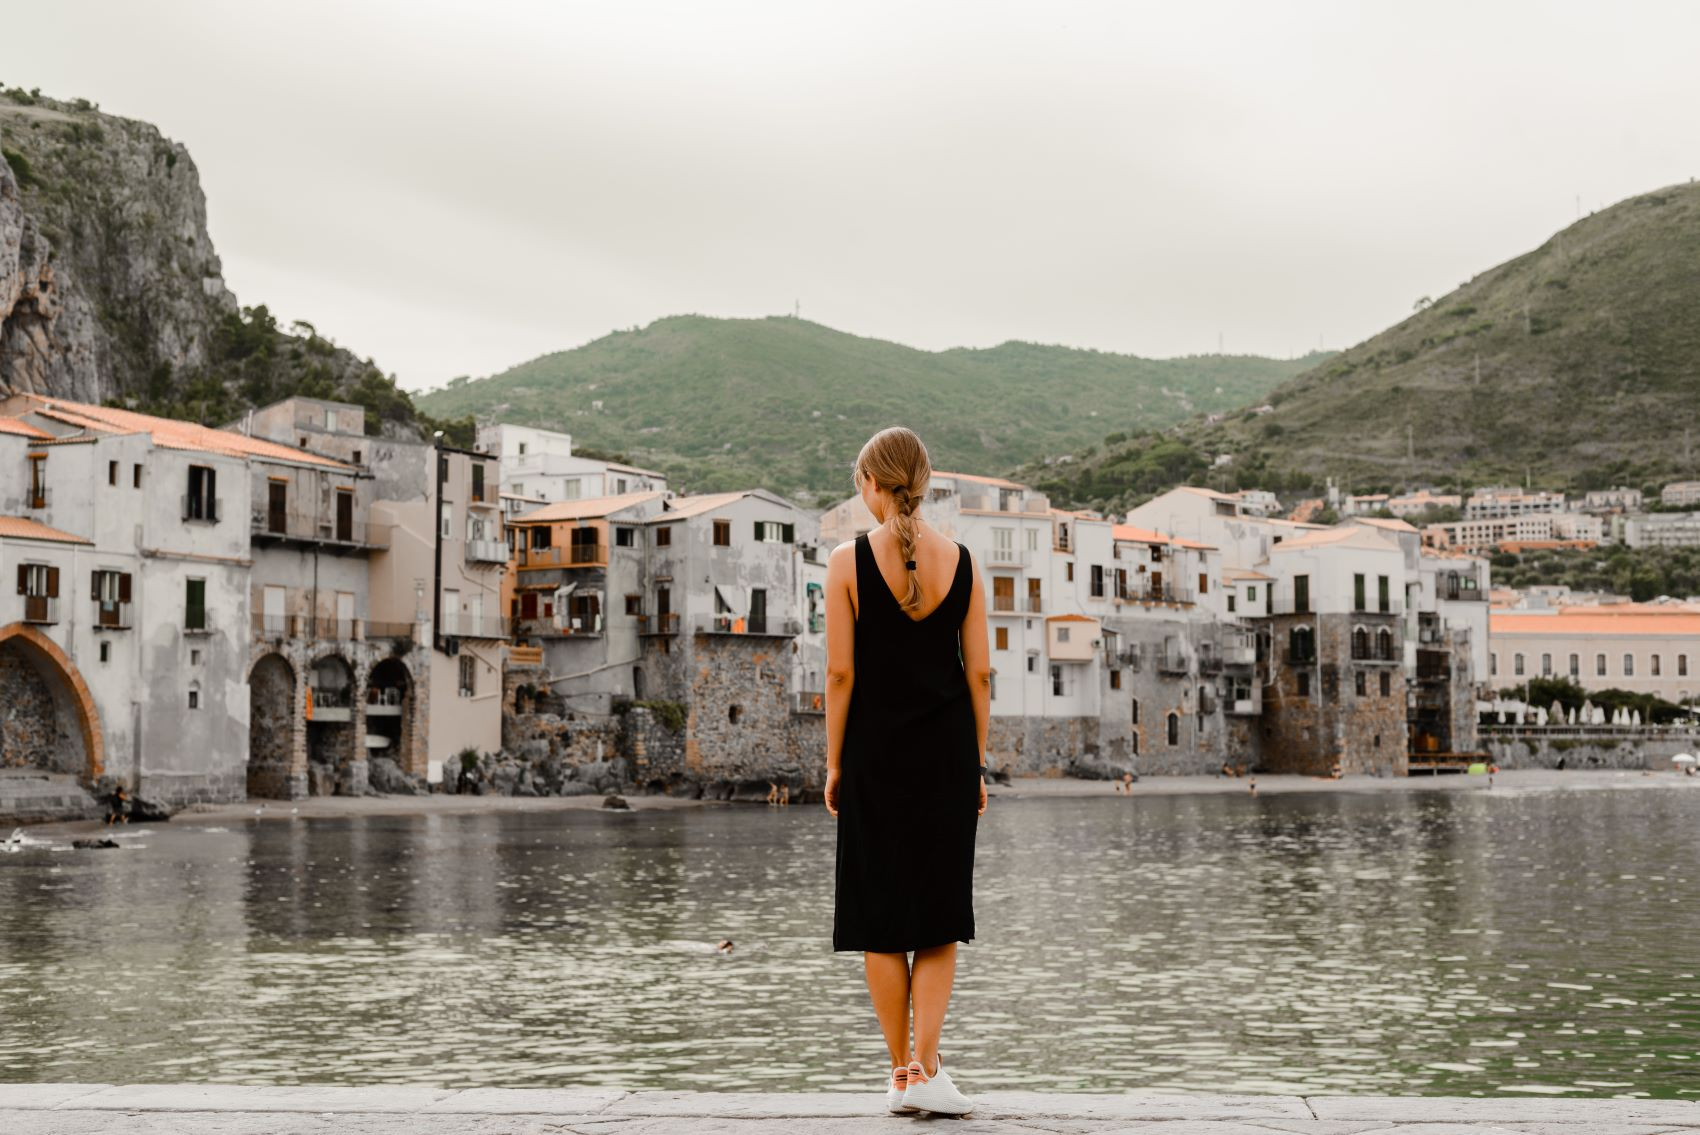 Życie na Sycylii By Frantsev, licencja Shutterstock